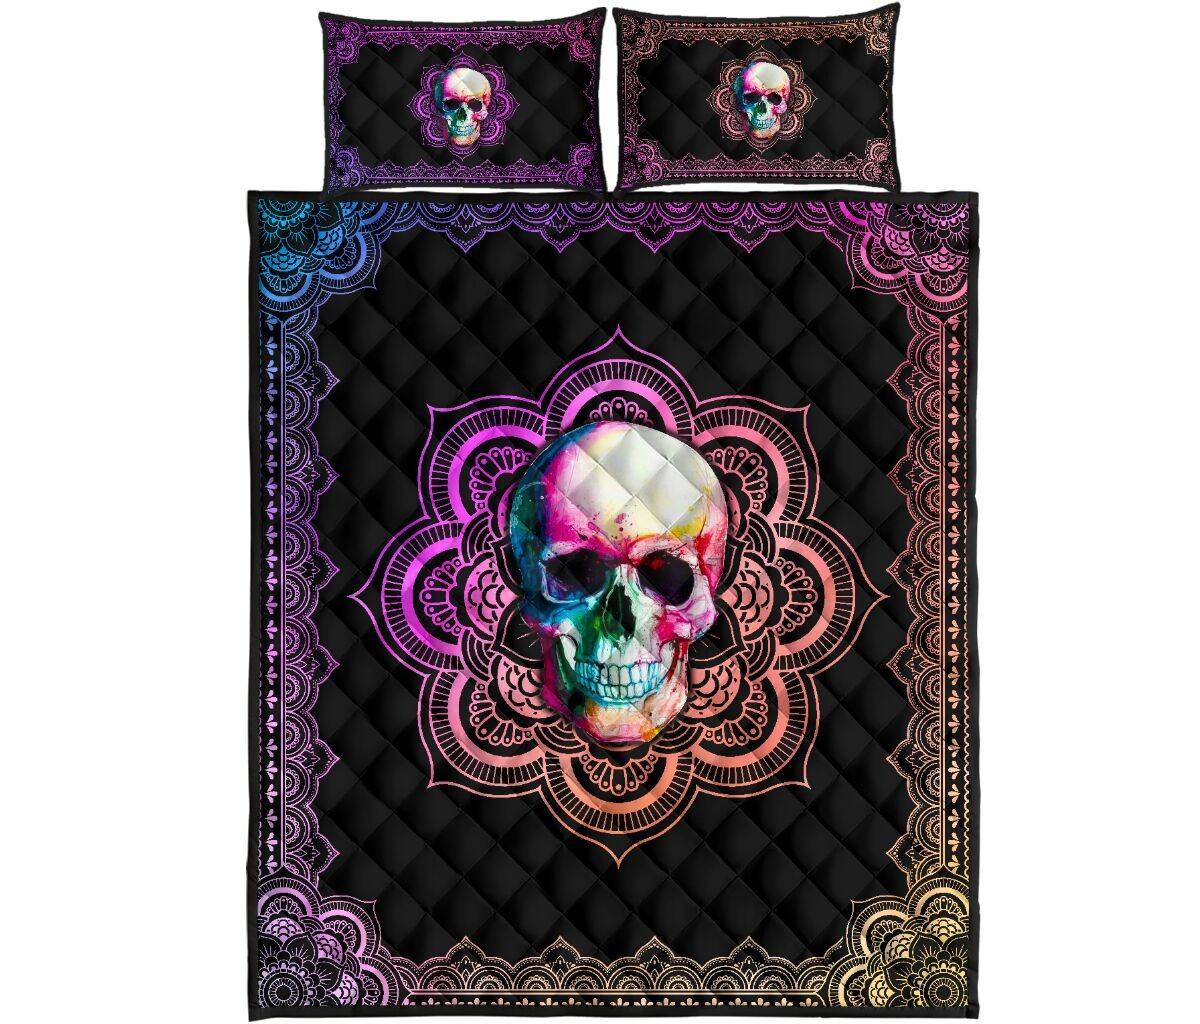 Skull mandala color quilt bedding set4